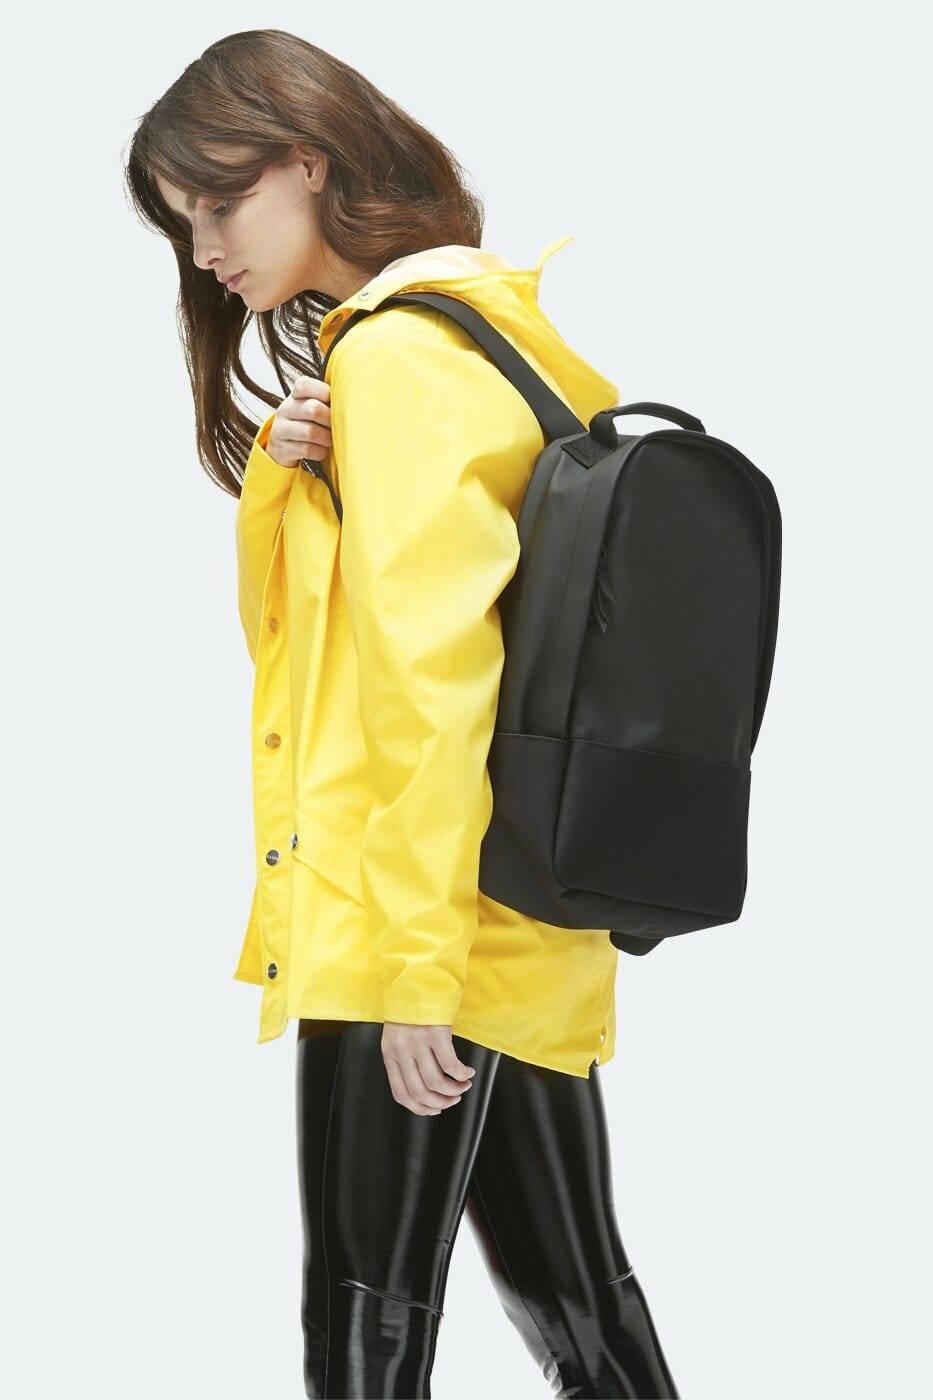 City_Backpack-Bags-1292-01_Black-3_1400x1400